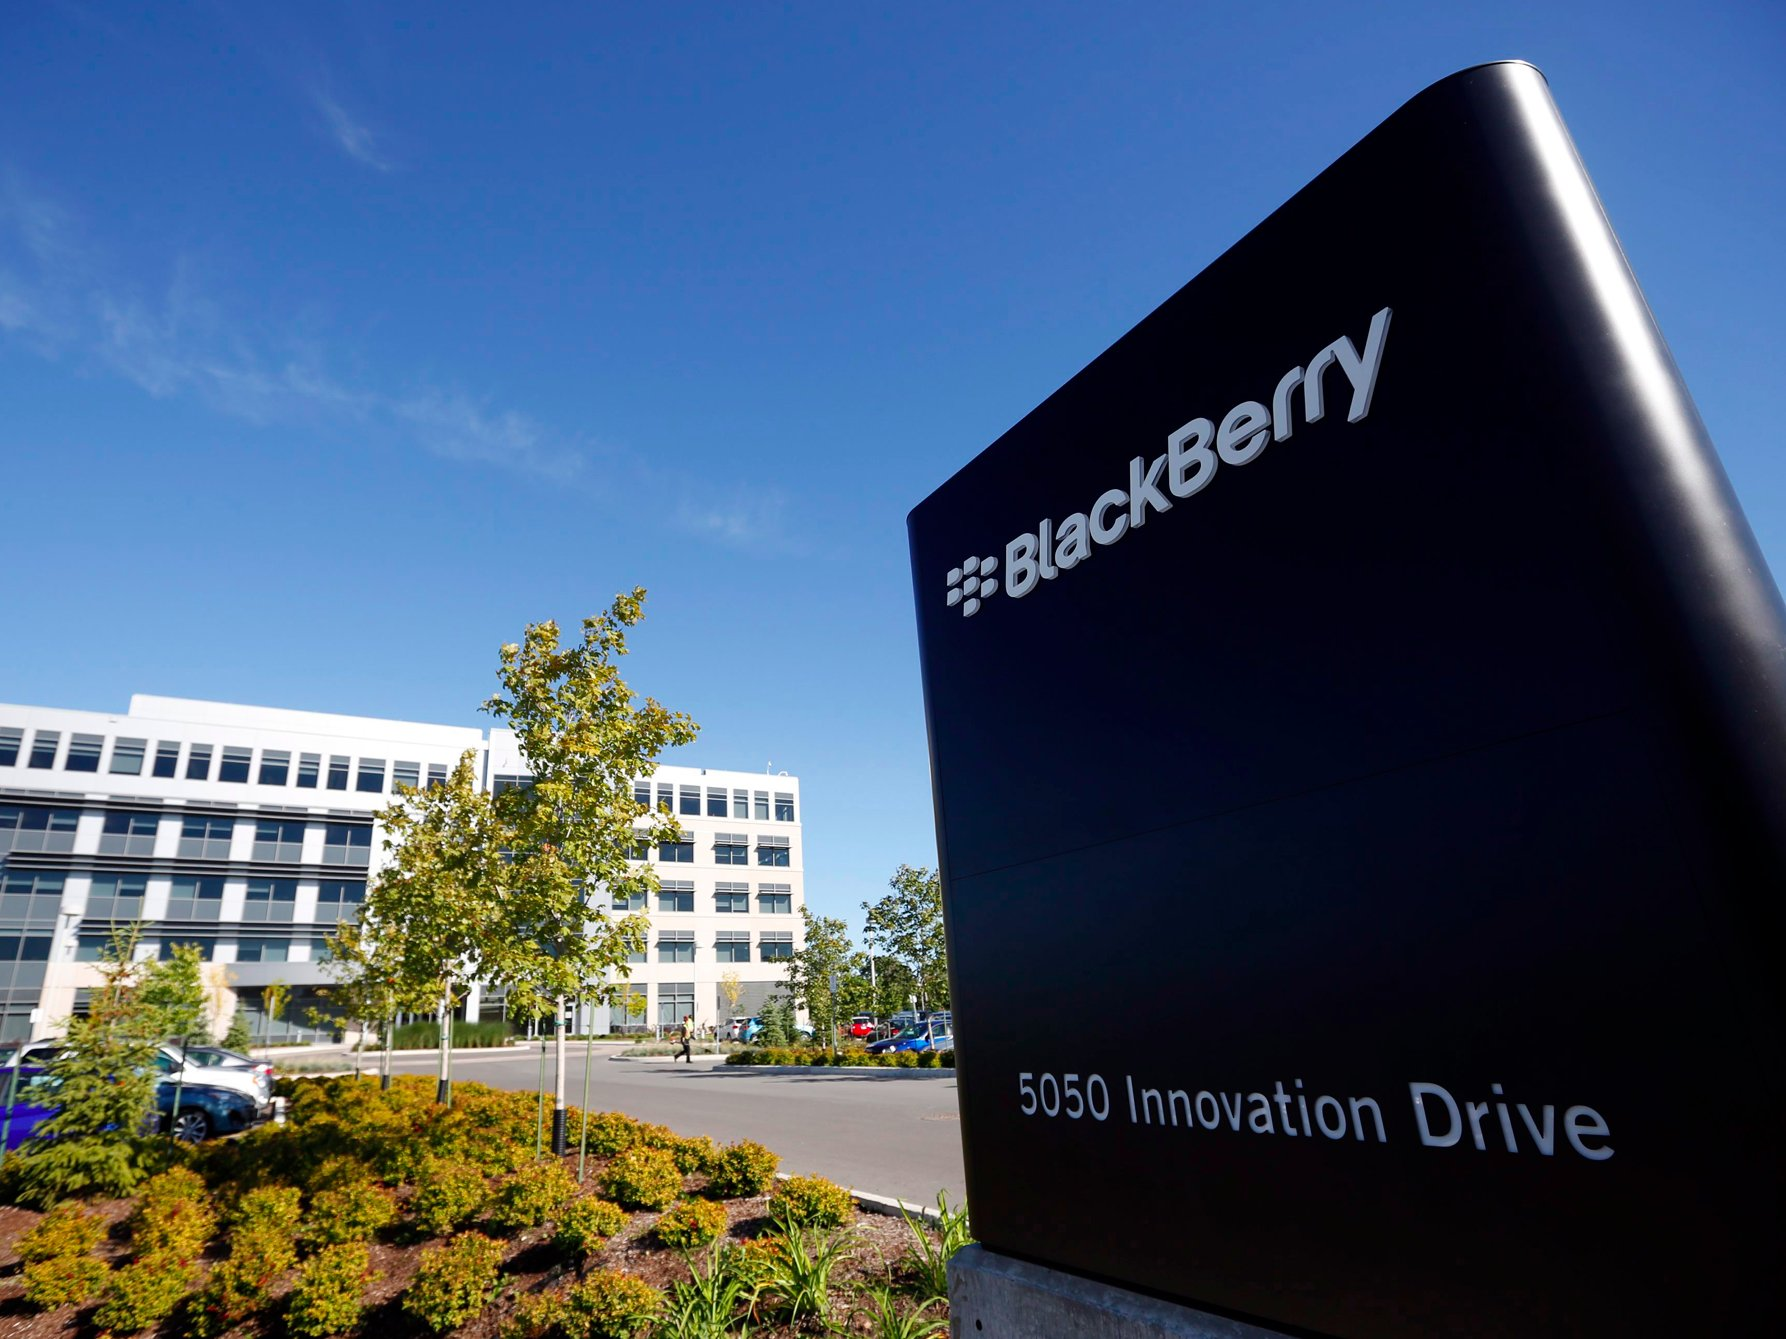 BlackBerry HQ